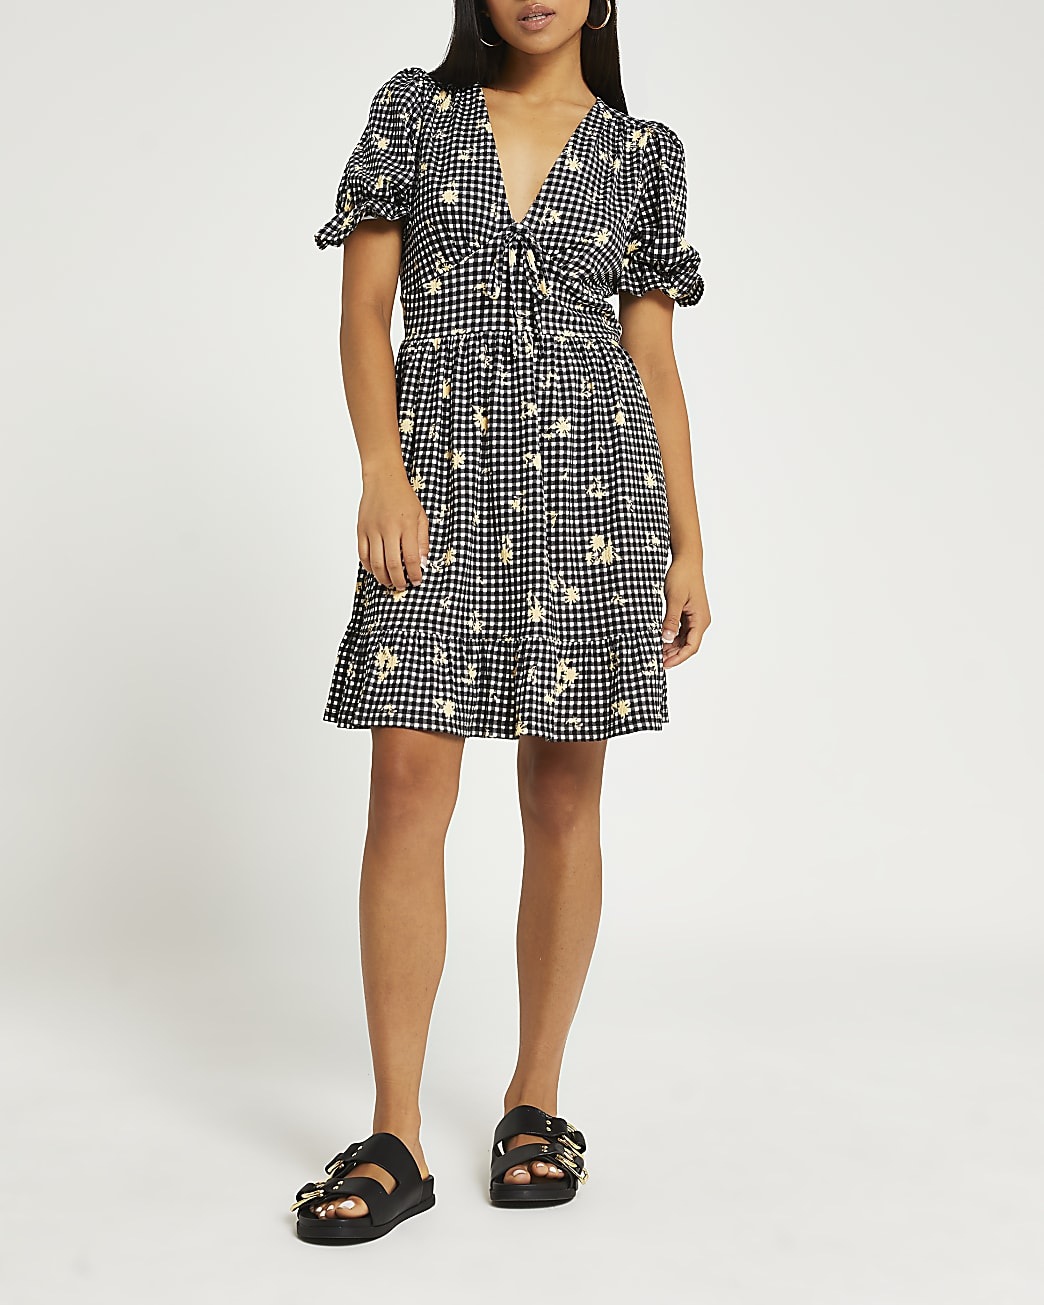 Petite black gingham embroidered mini dress